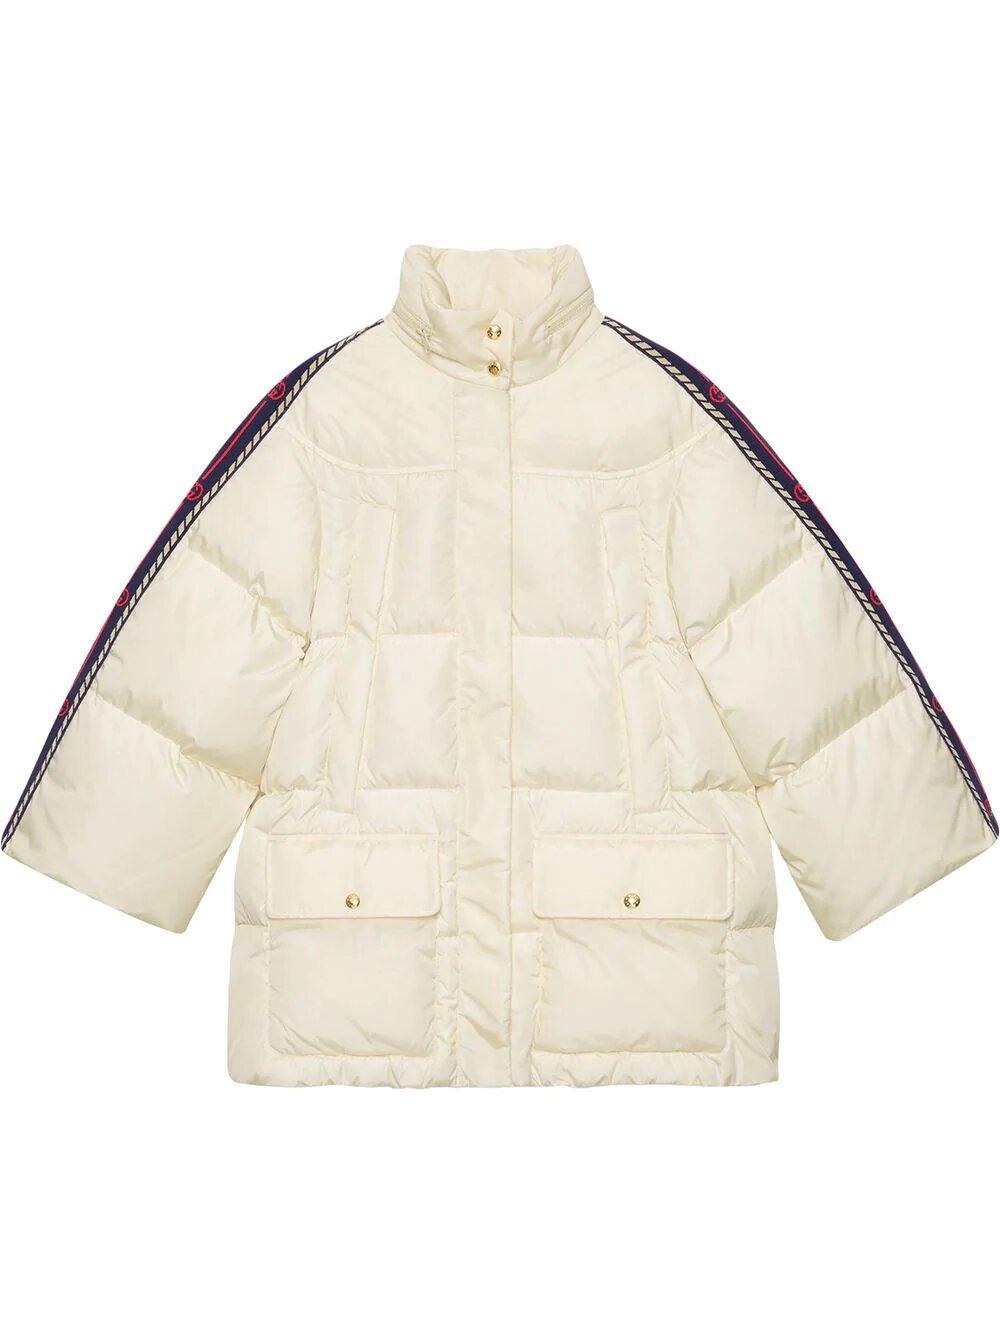 Gucci, Web-panelled padded jacket 3842лв